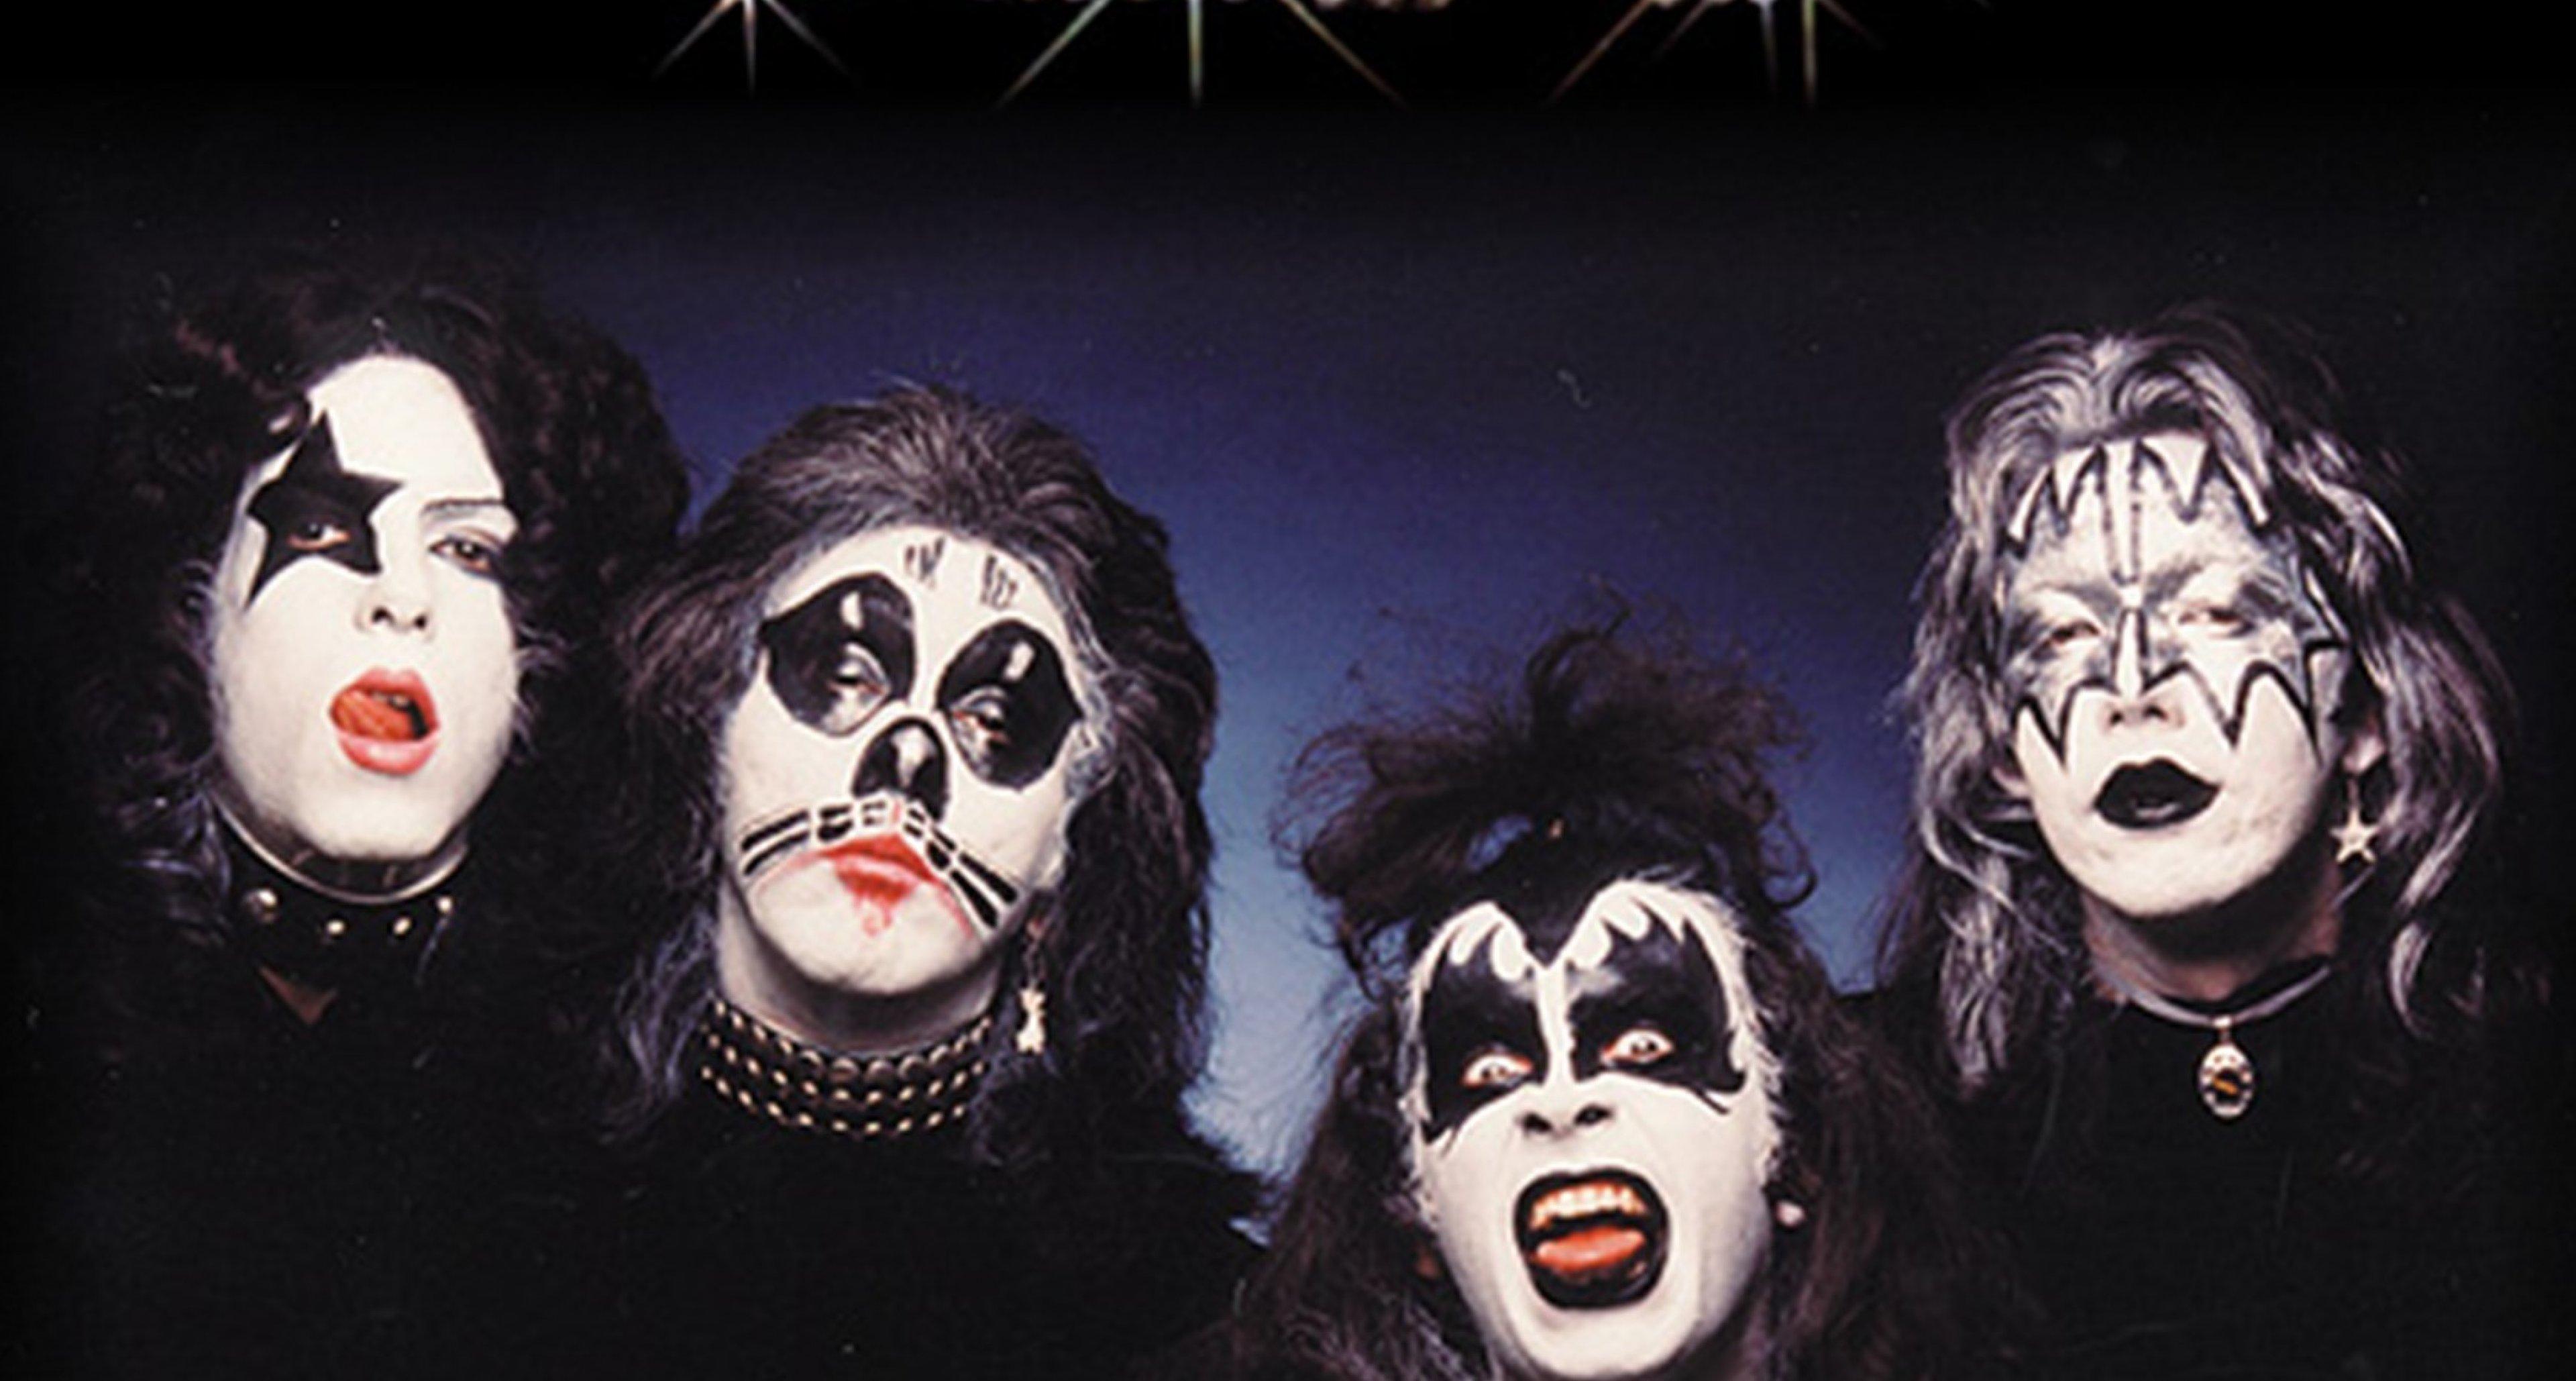 Kiss, by Kiss